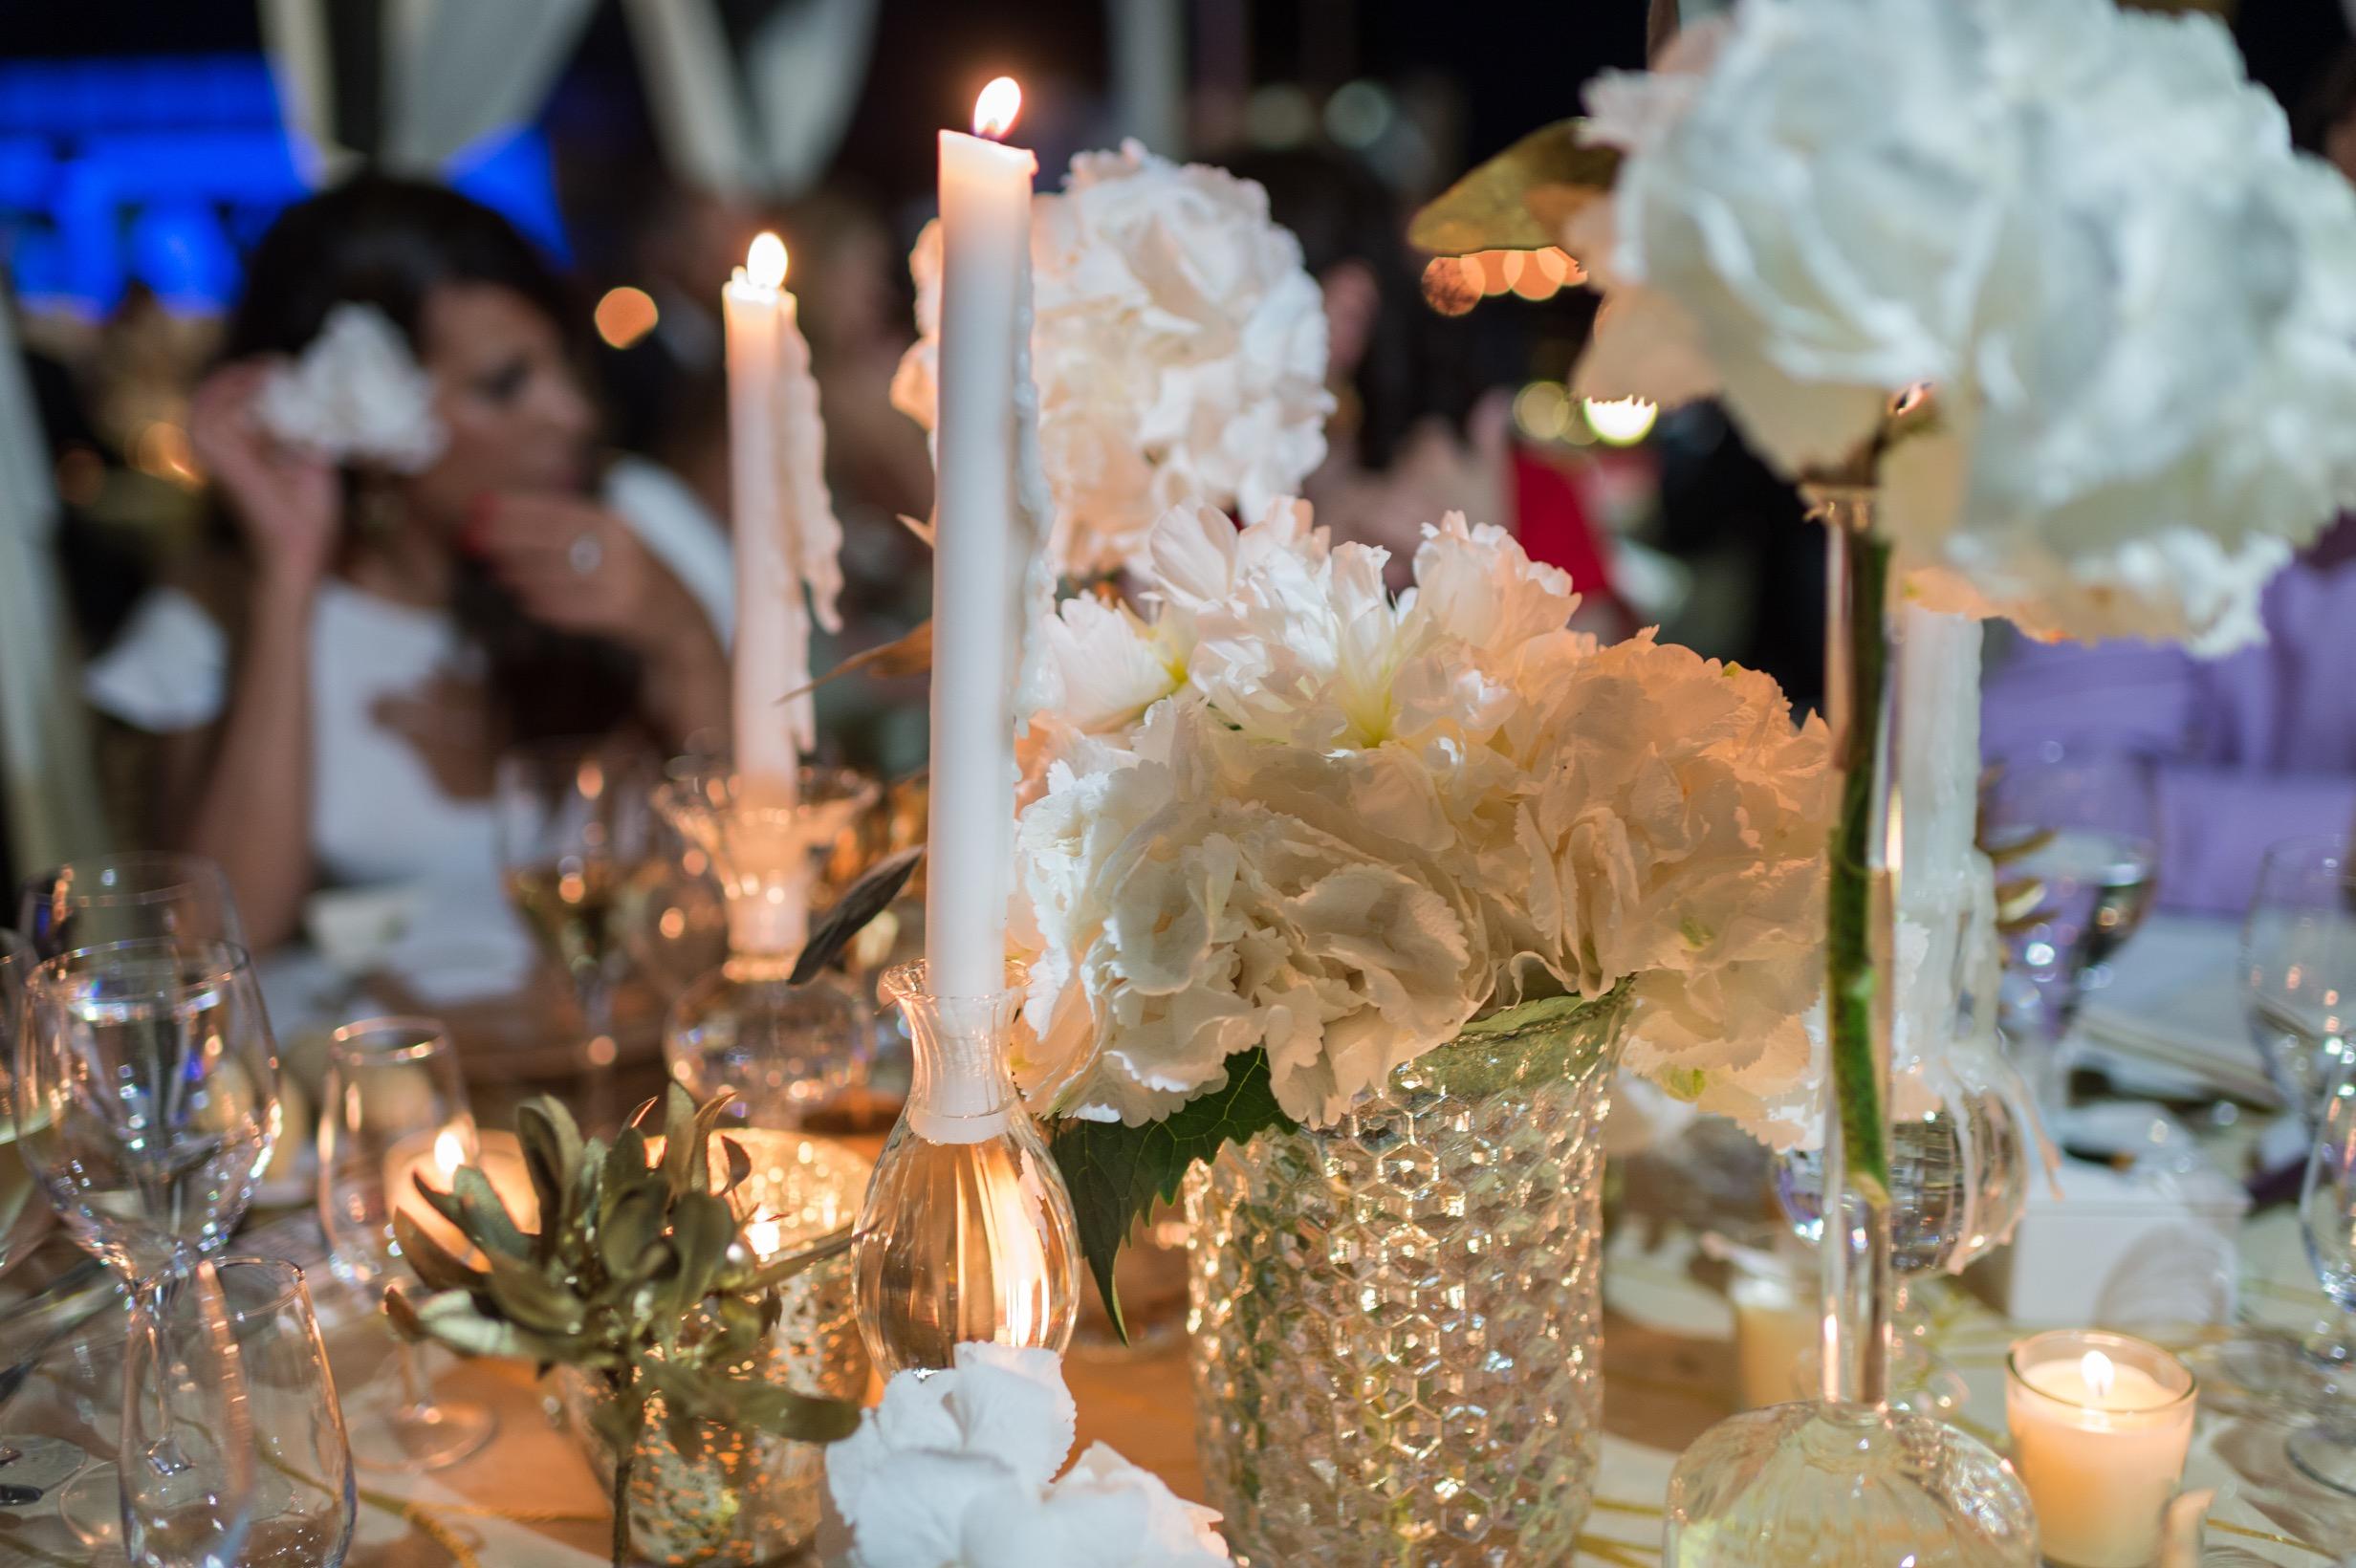 Si-Quiero-Wedding-Planner-By-Sira-Antequera-Bodas-Málaga-Marbella-Miami- Sandra-Rafa-18